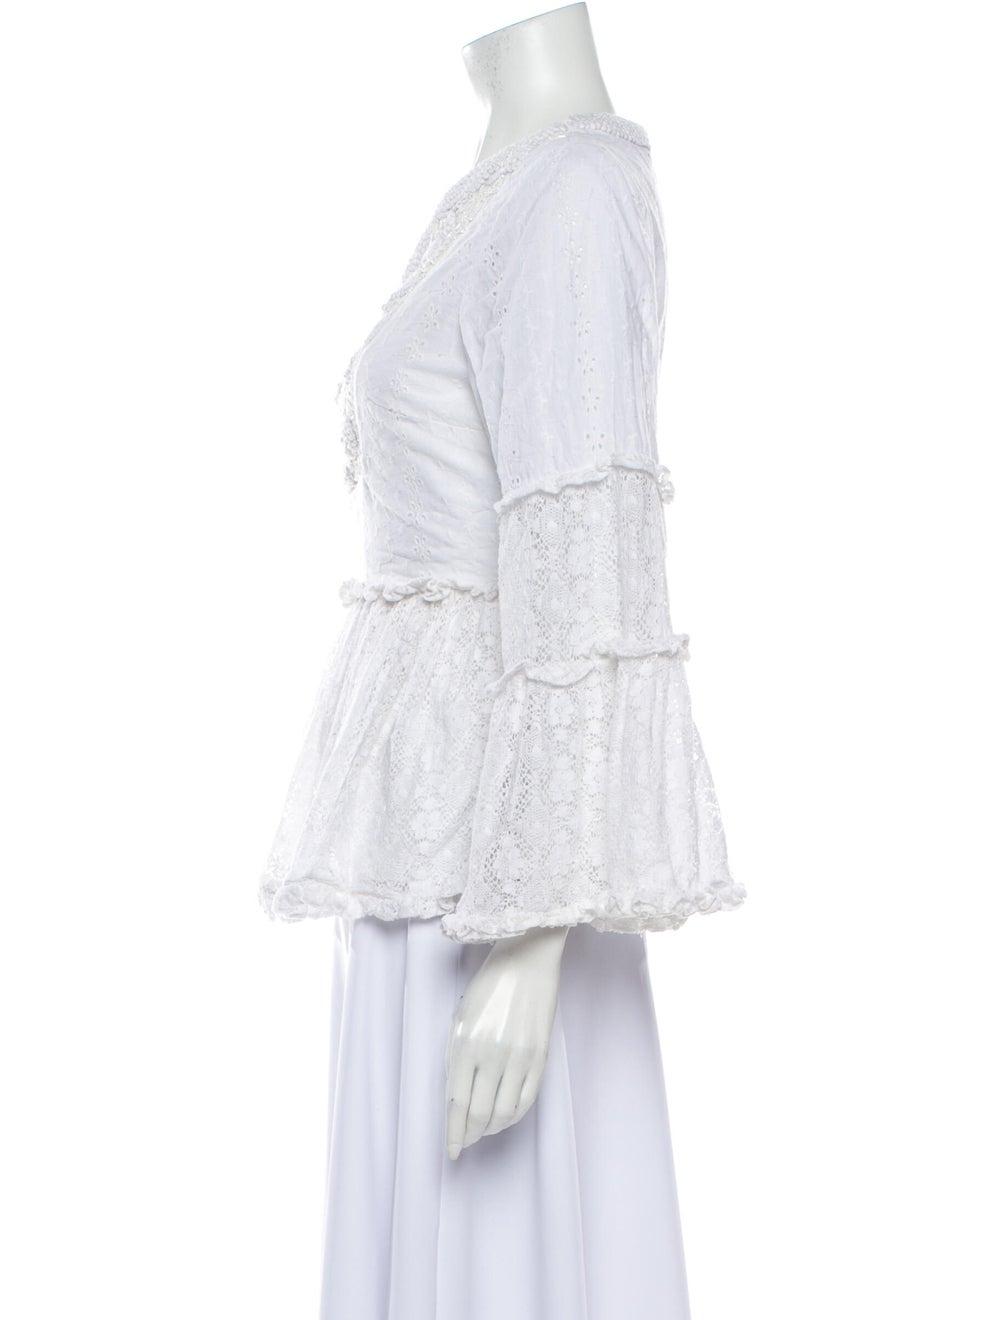 Alexis Lace Pattern V-Neck Blouse White - image 2